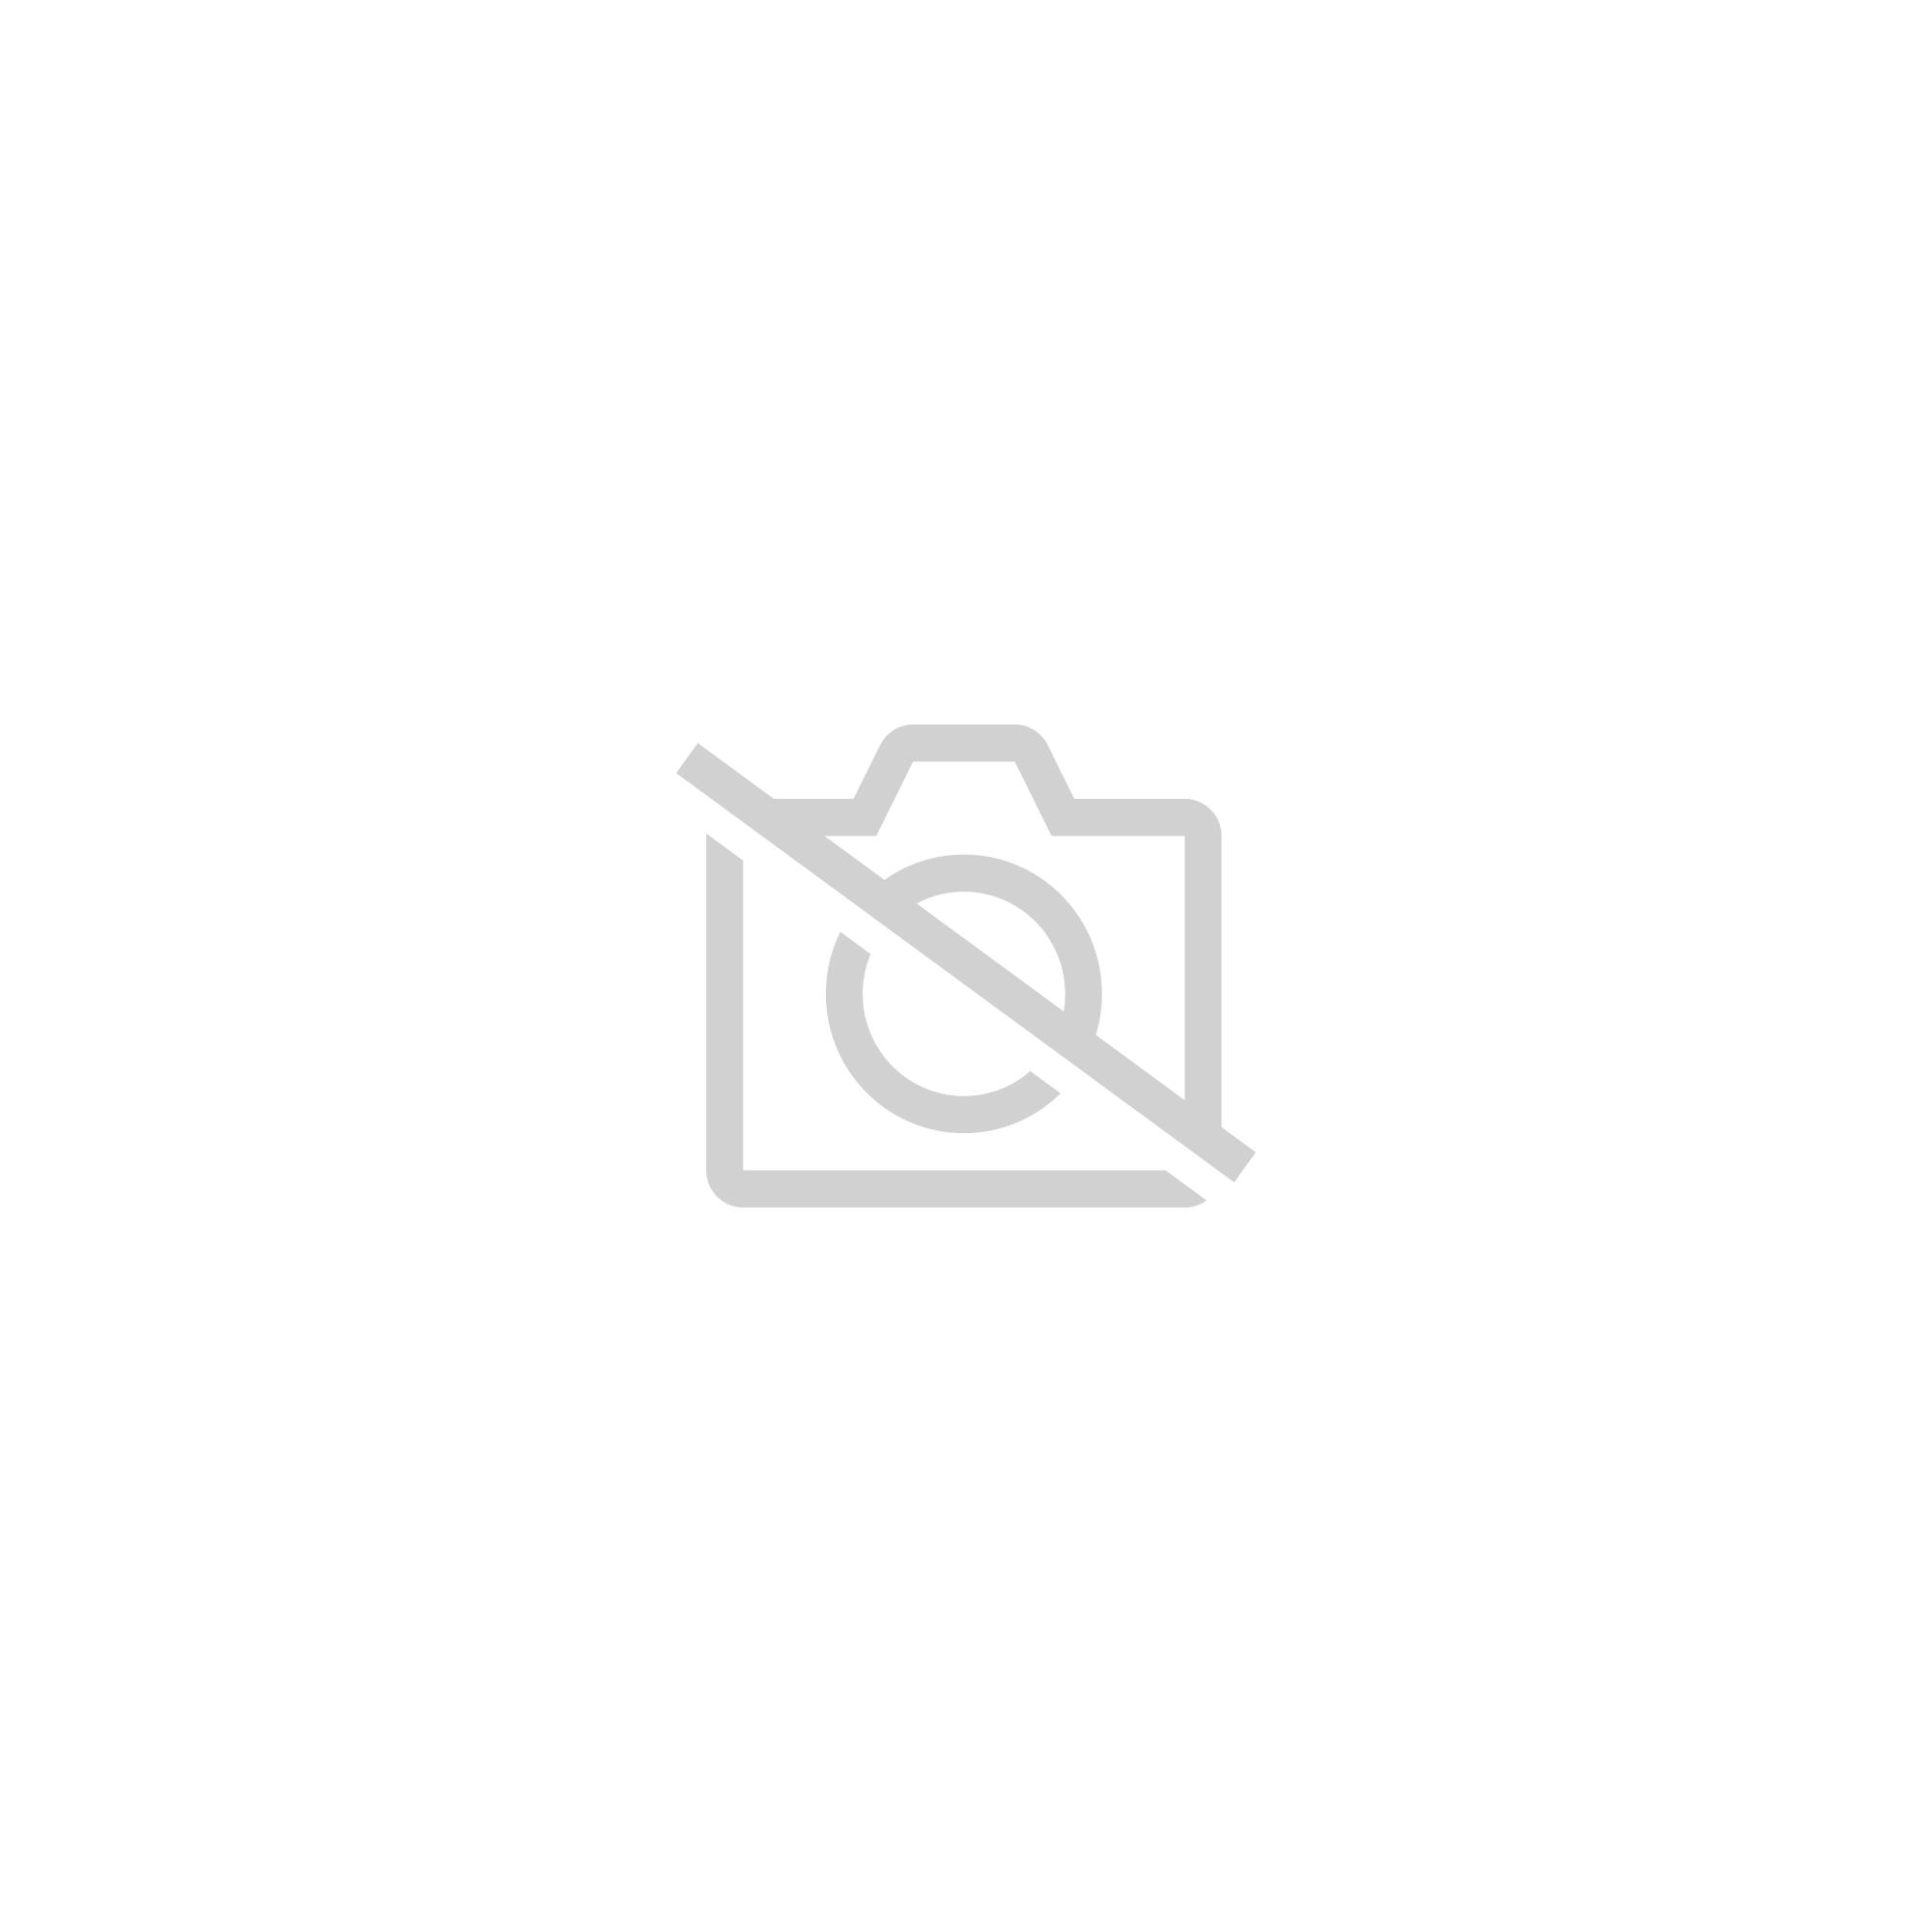 Boucles D'oreilles Shamballa Double Perle Blanche (Eve Mode)